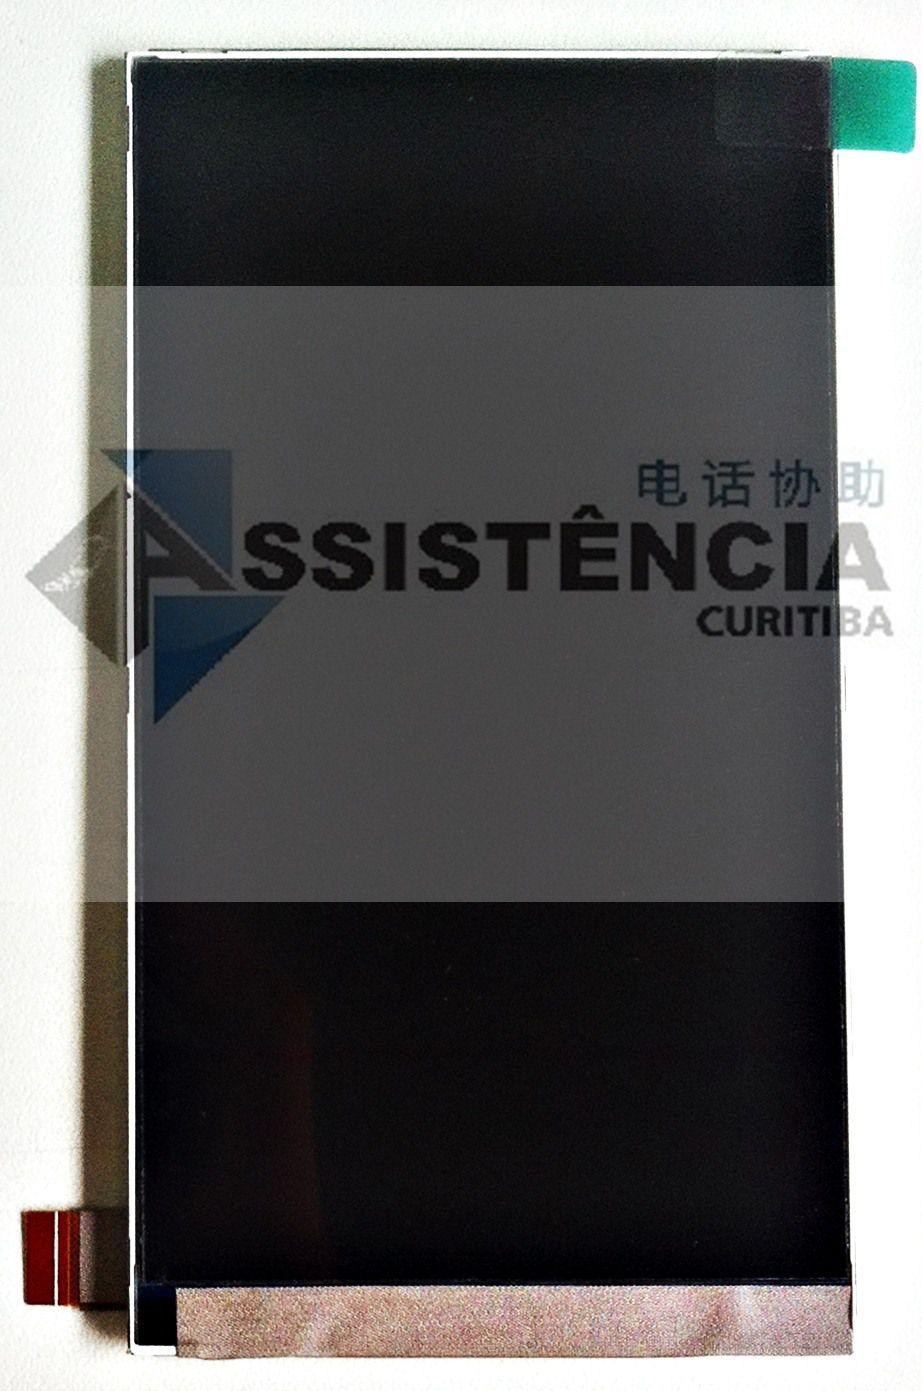 TELA DISPLAY LCD CELULAR CCE SC452 SC 452